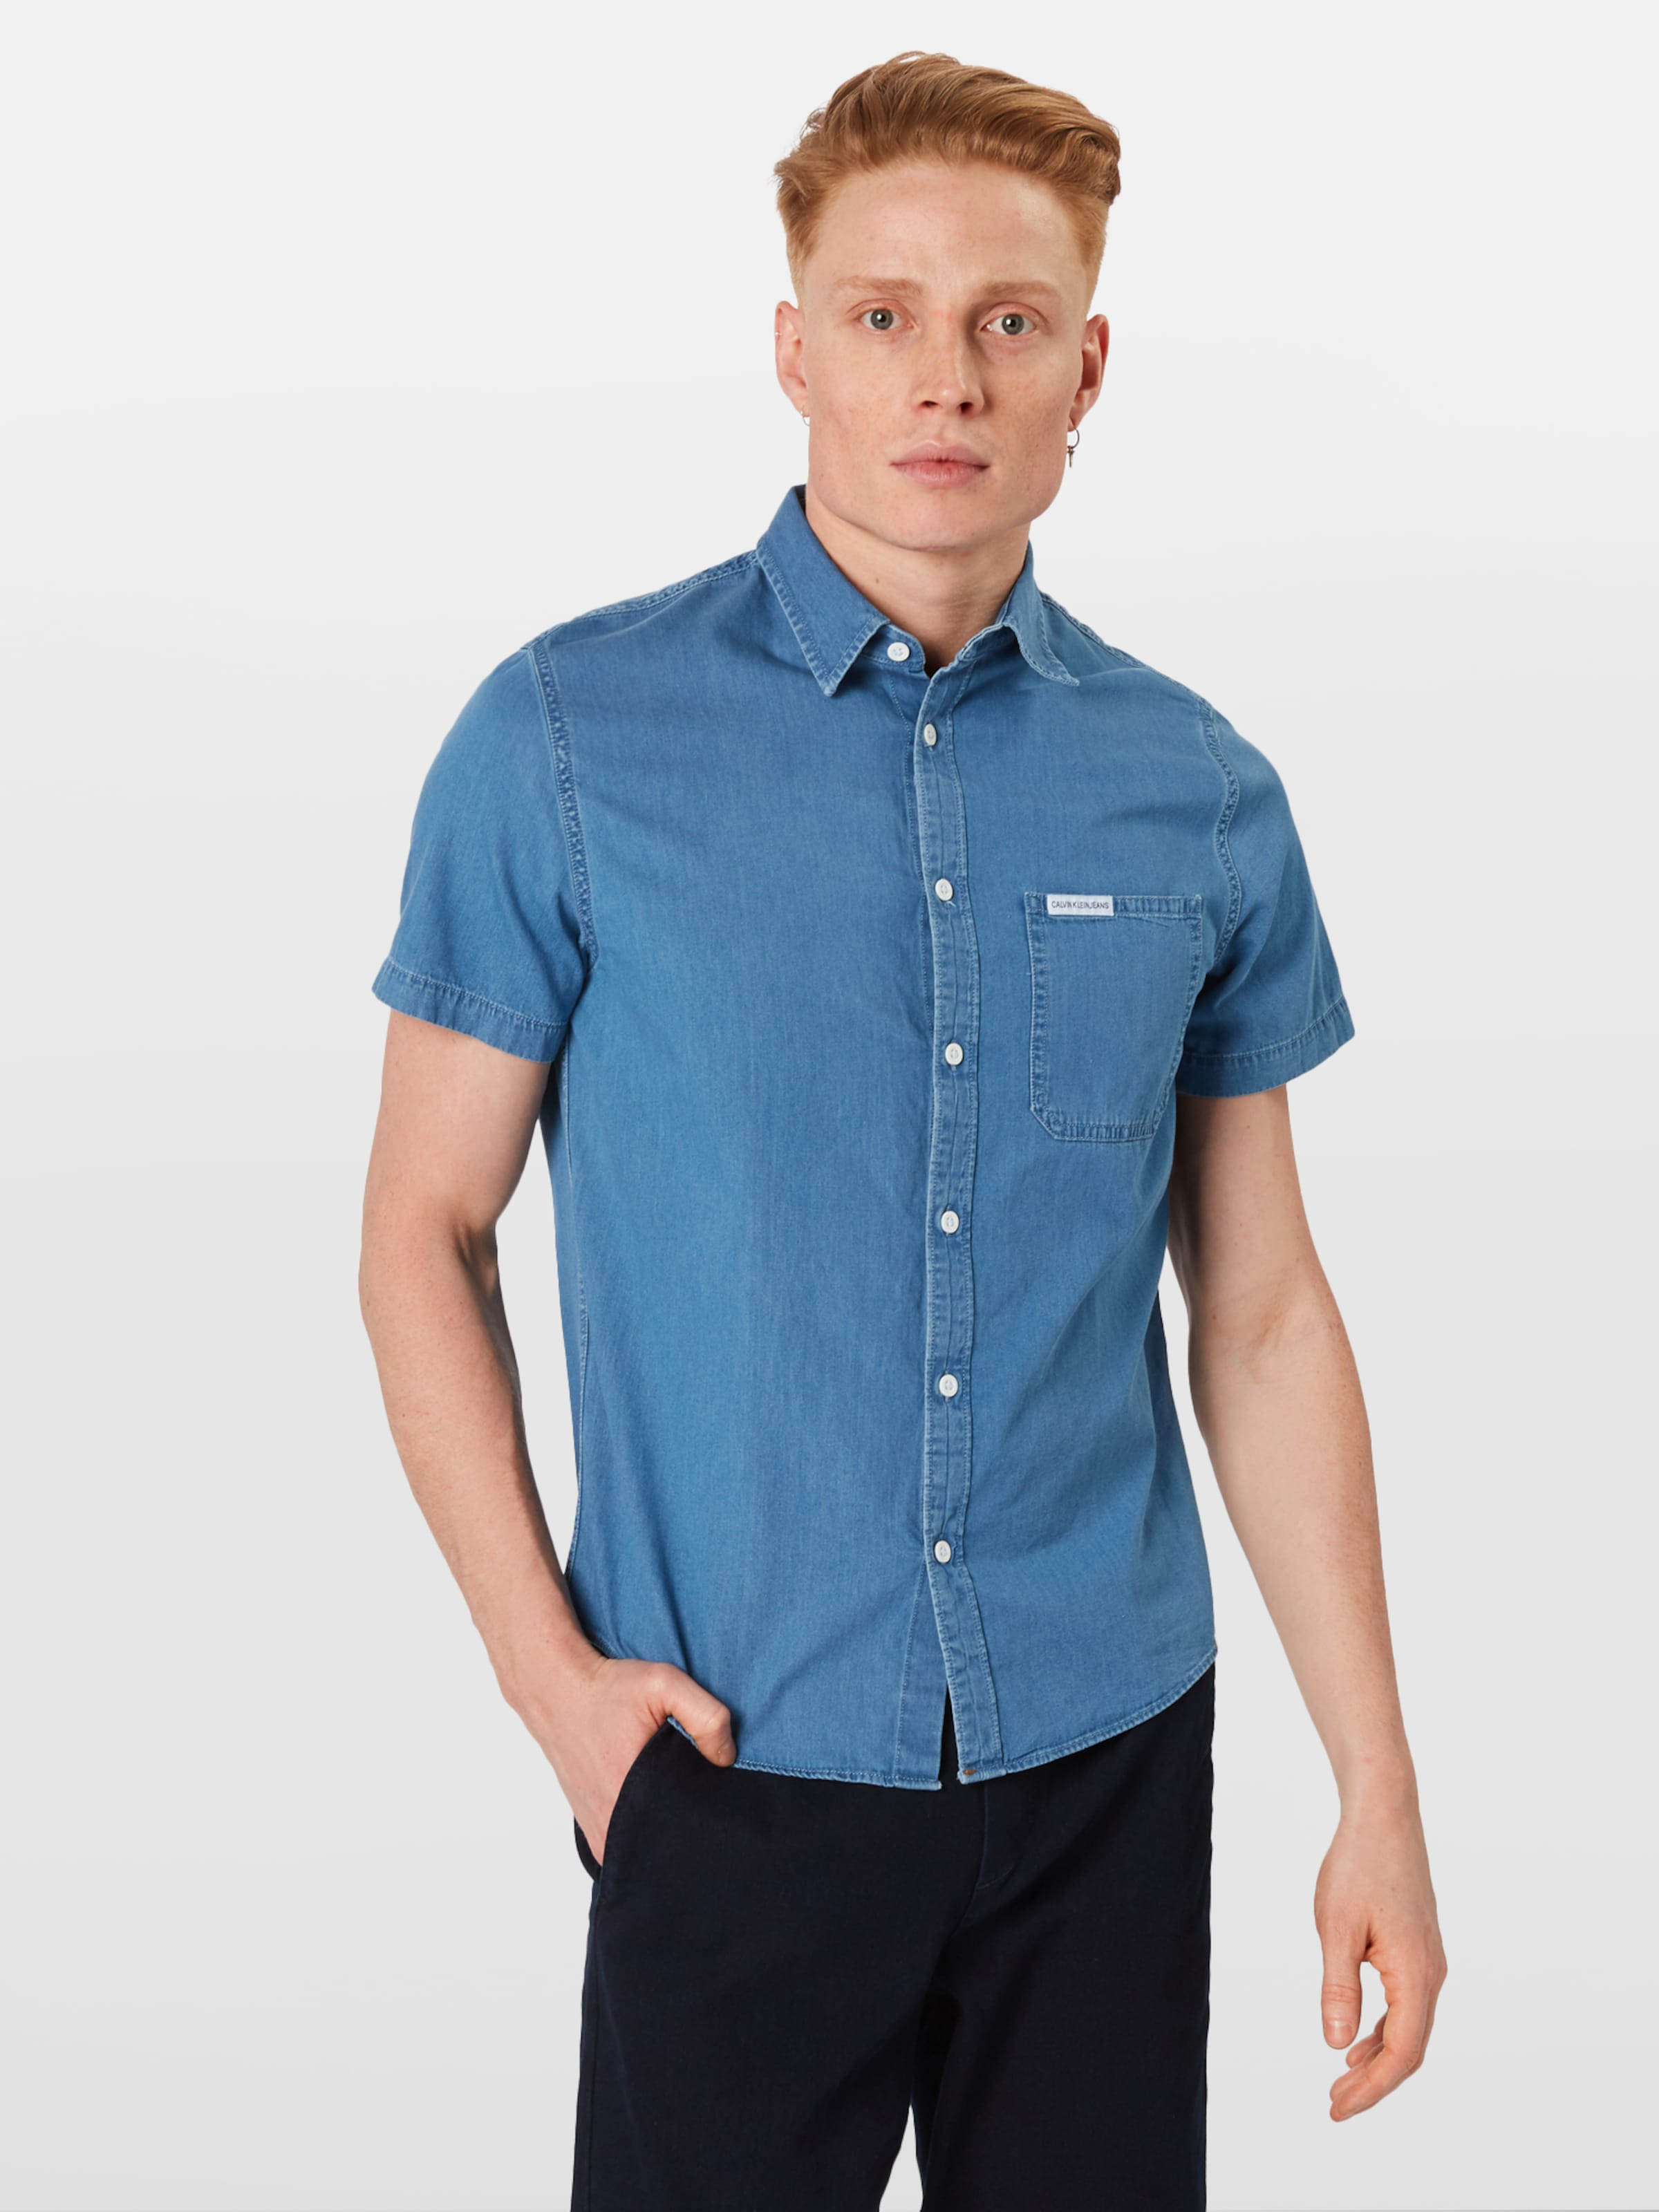 Jeans Reg In Pocket Calvin Instit Indigo 'indigo Ss' Klein Hemd KJcTul1F3